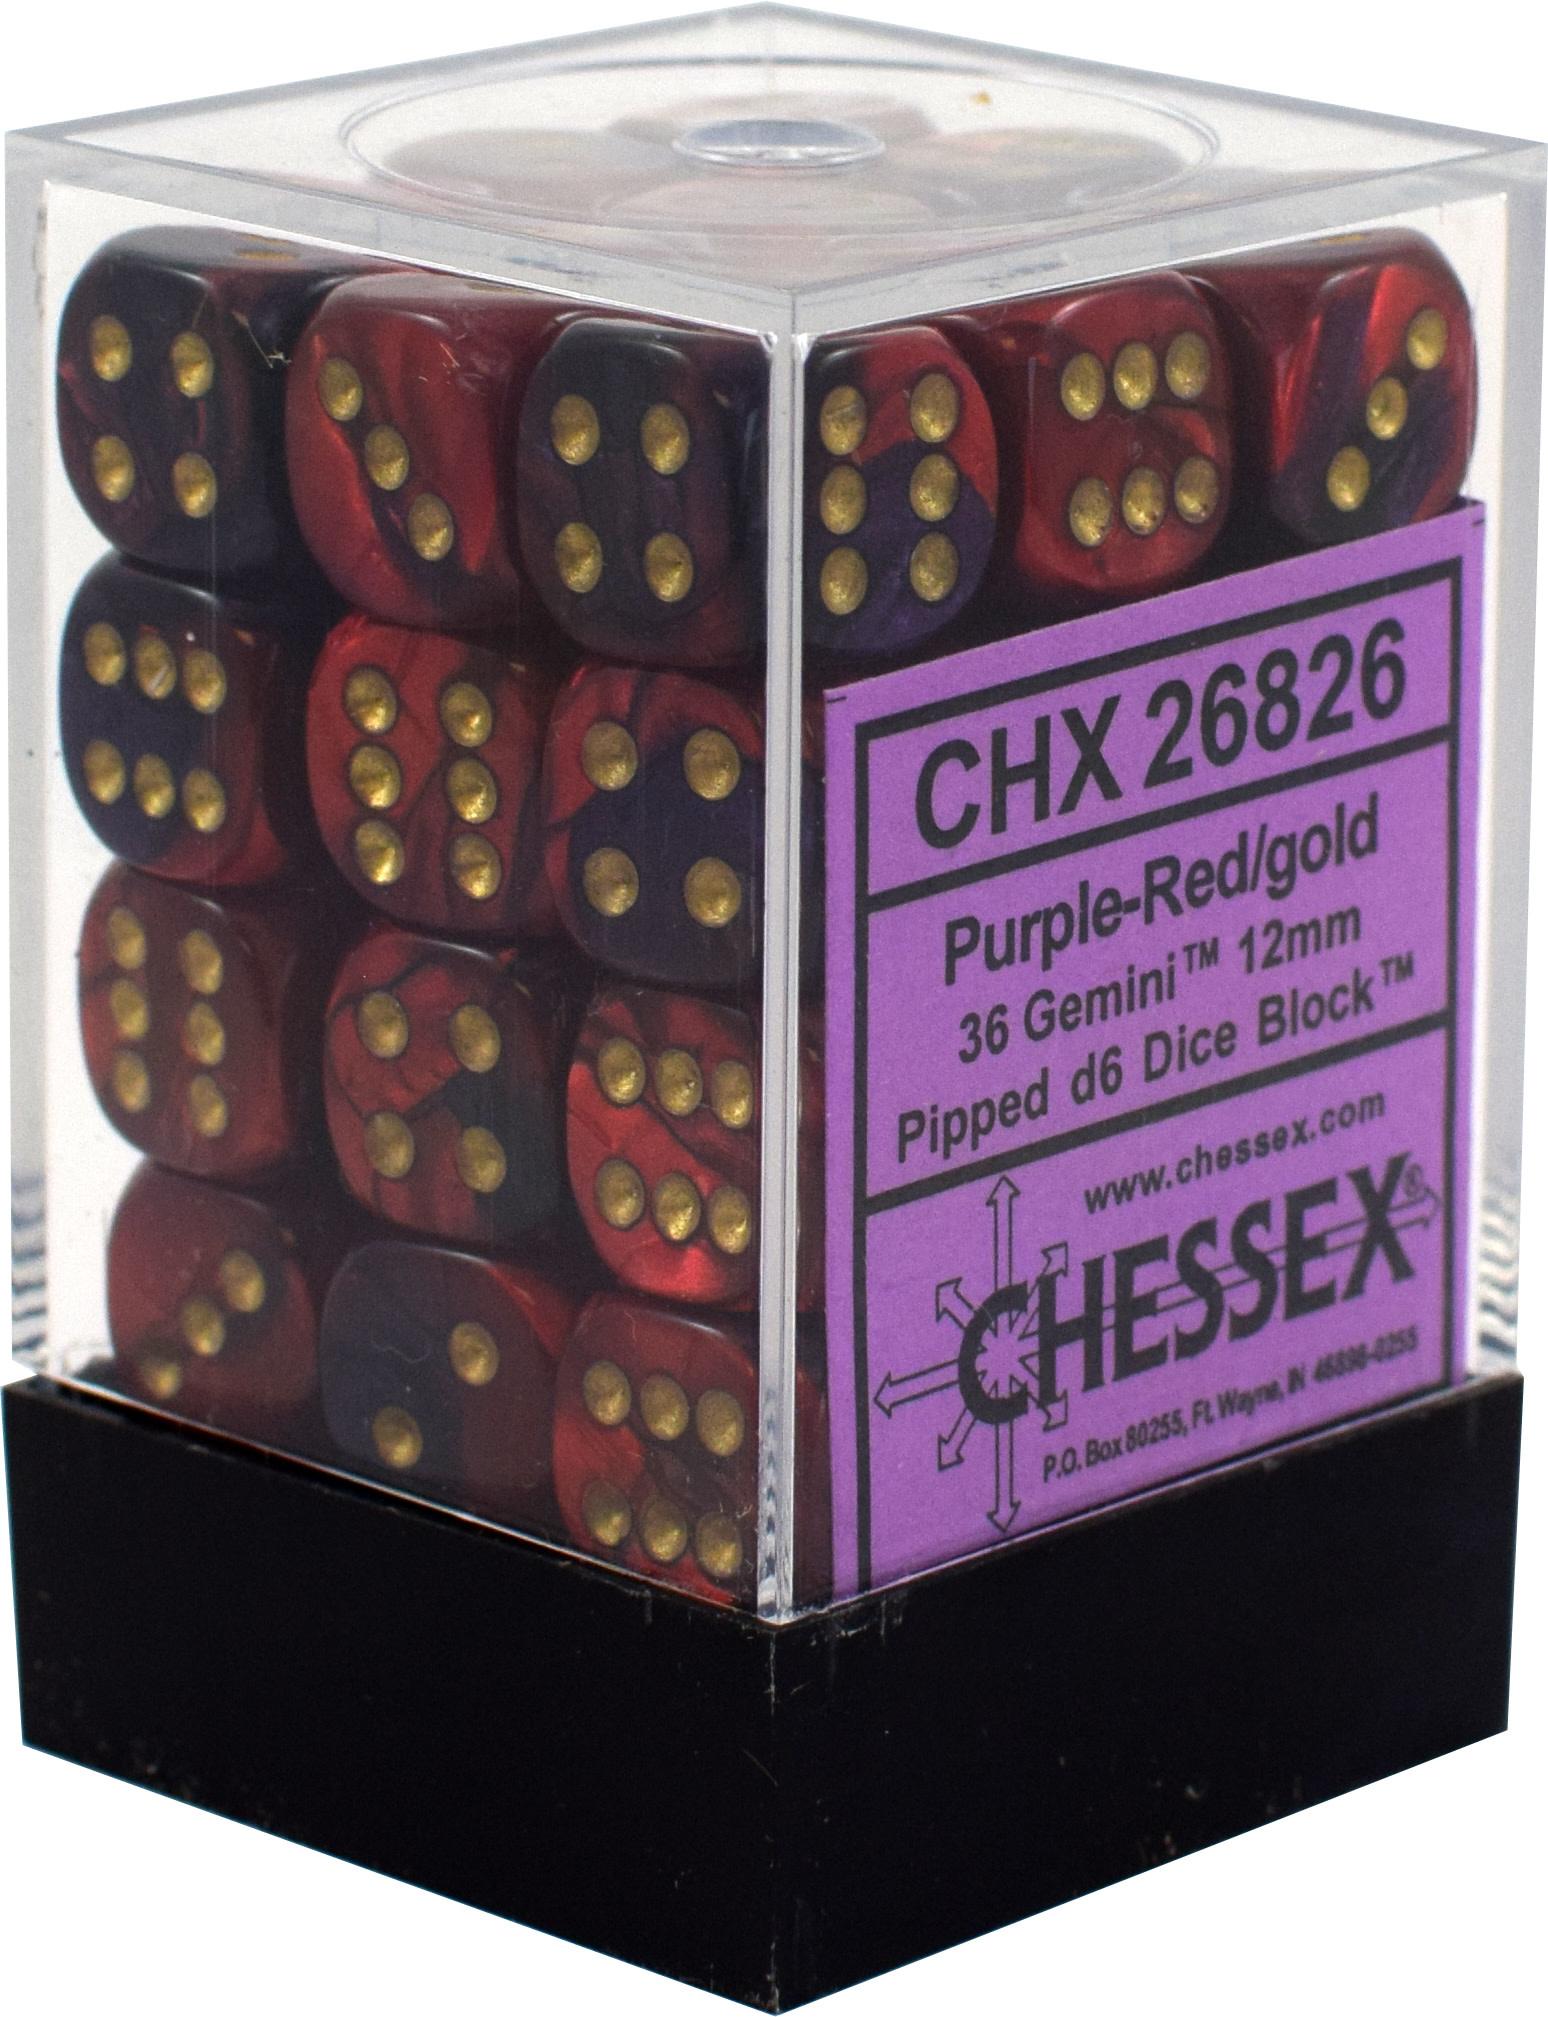 Chessex Chessex Gemini Purple-Red/Silver Set of 36 D6 Dice